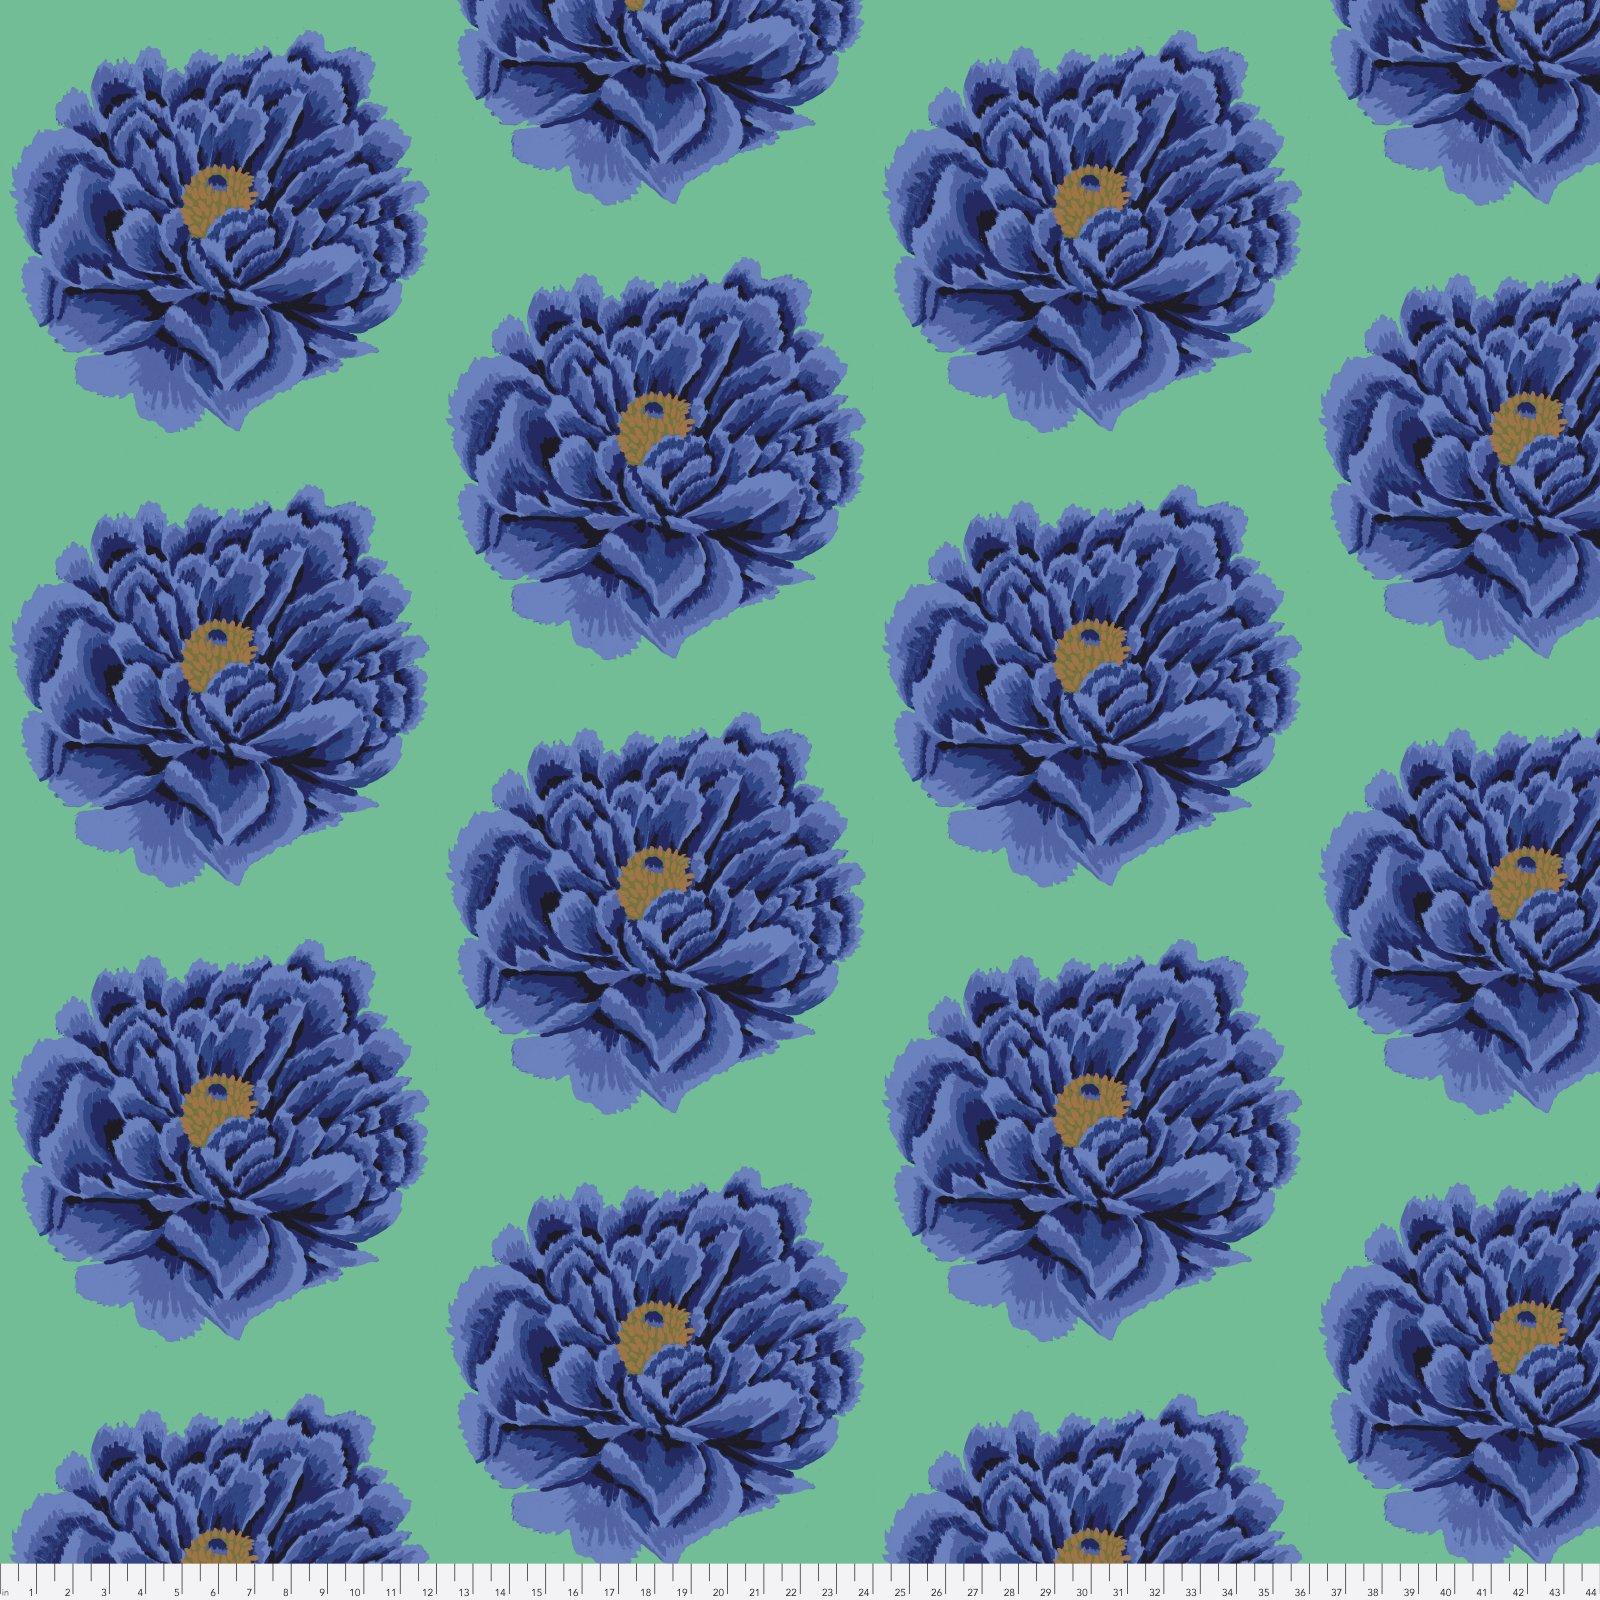 QBGP004.2BLUE FAll 2018 Full Blown Blue 100% Cotton Sateen Chintz 108